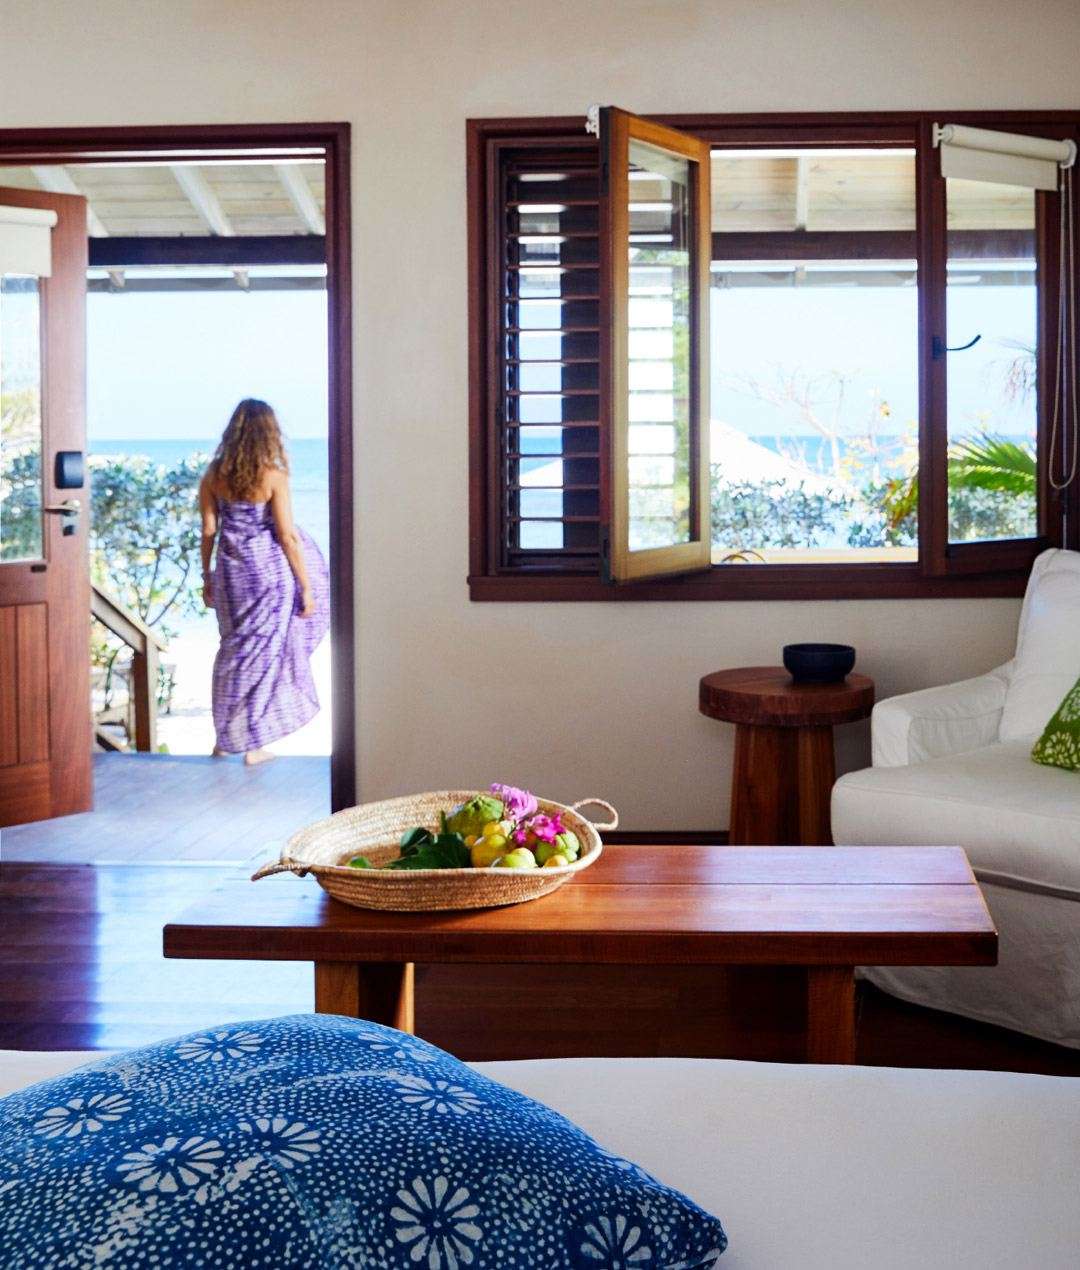 7-one-bedroom-beach-villa-carousel-3